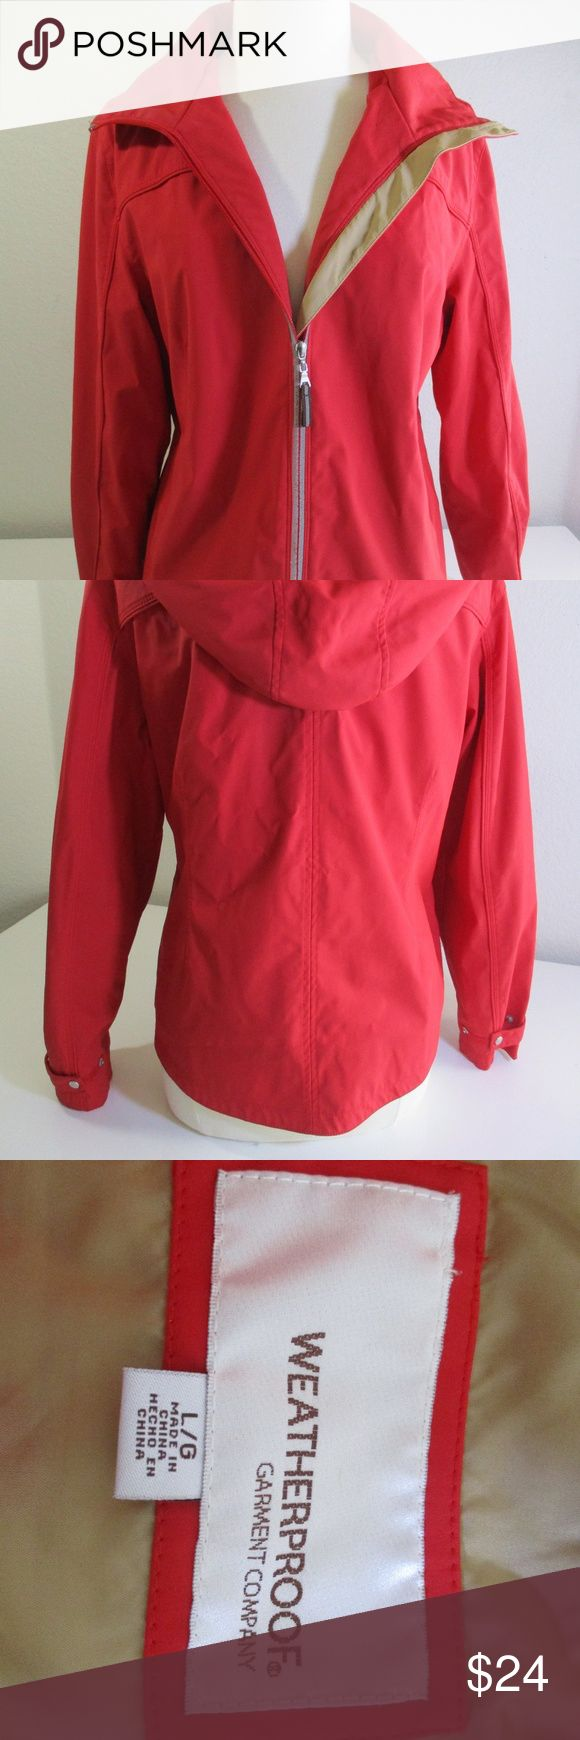 Weatherproof Rain Slicker Jacket Red Hooded sz L Weatherproof Garment Co  Rain Slicker, Windbreaker, Jacket Hooded  Red, Tan Women sz L Weatherproof Jackets & Coats Utility Jackets